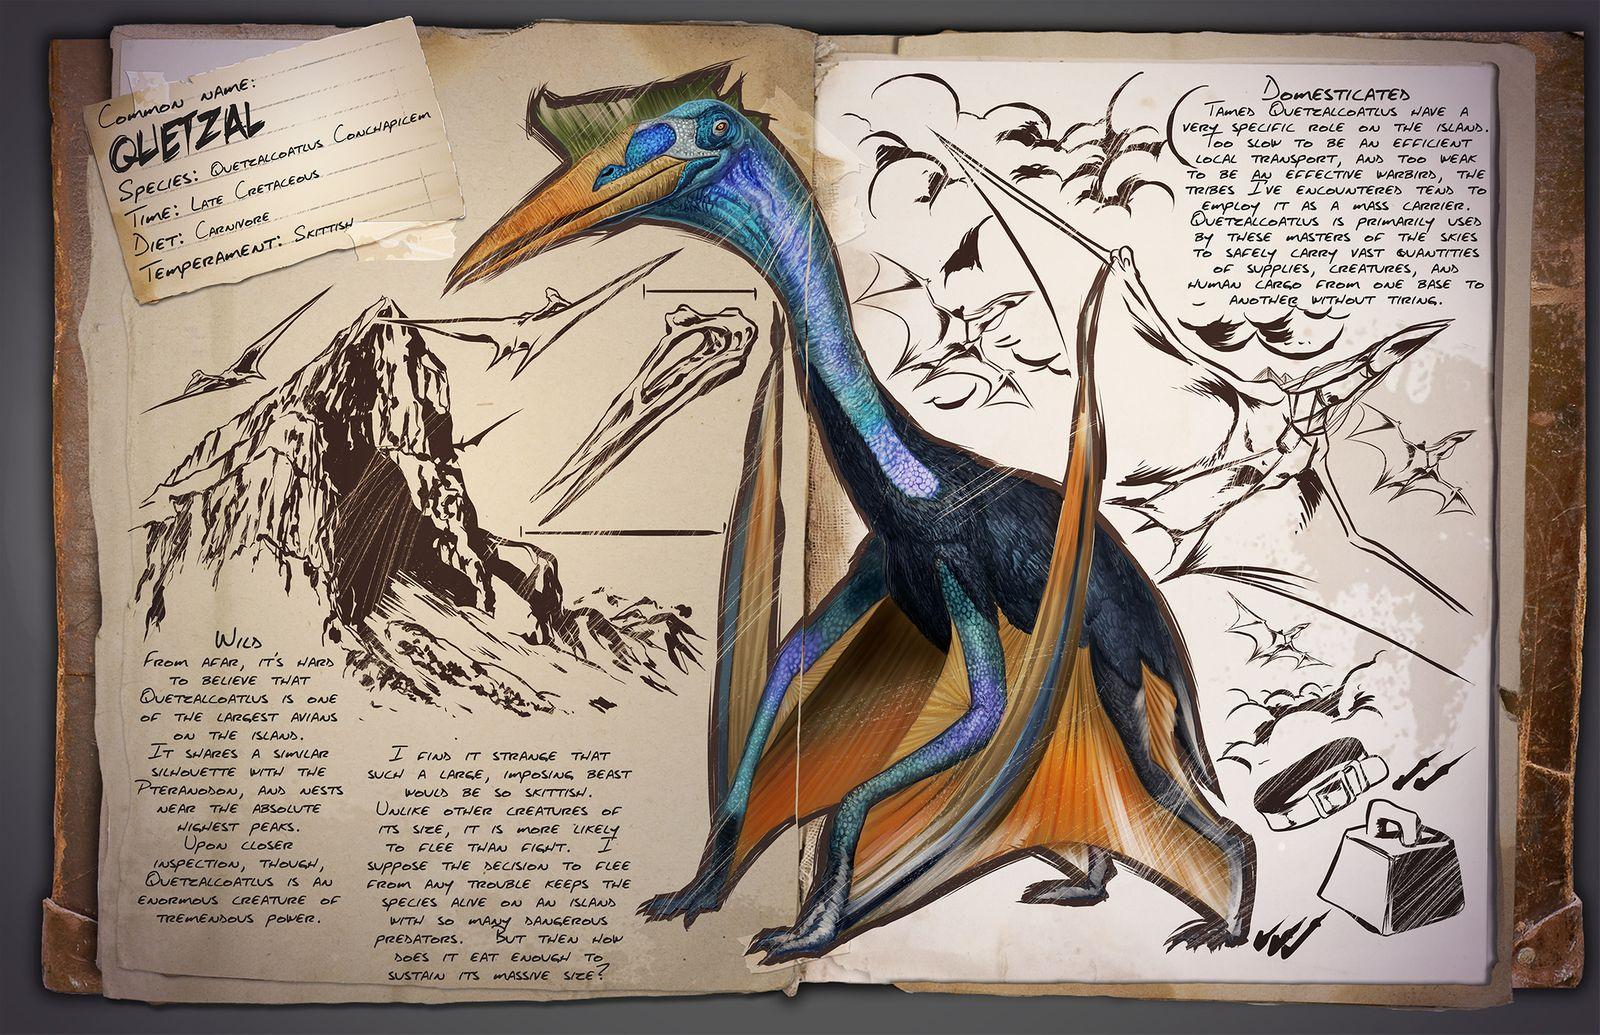 Dino Dossier: Quetzalcoatlus aka Quetzal